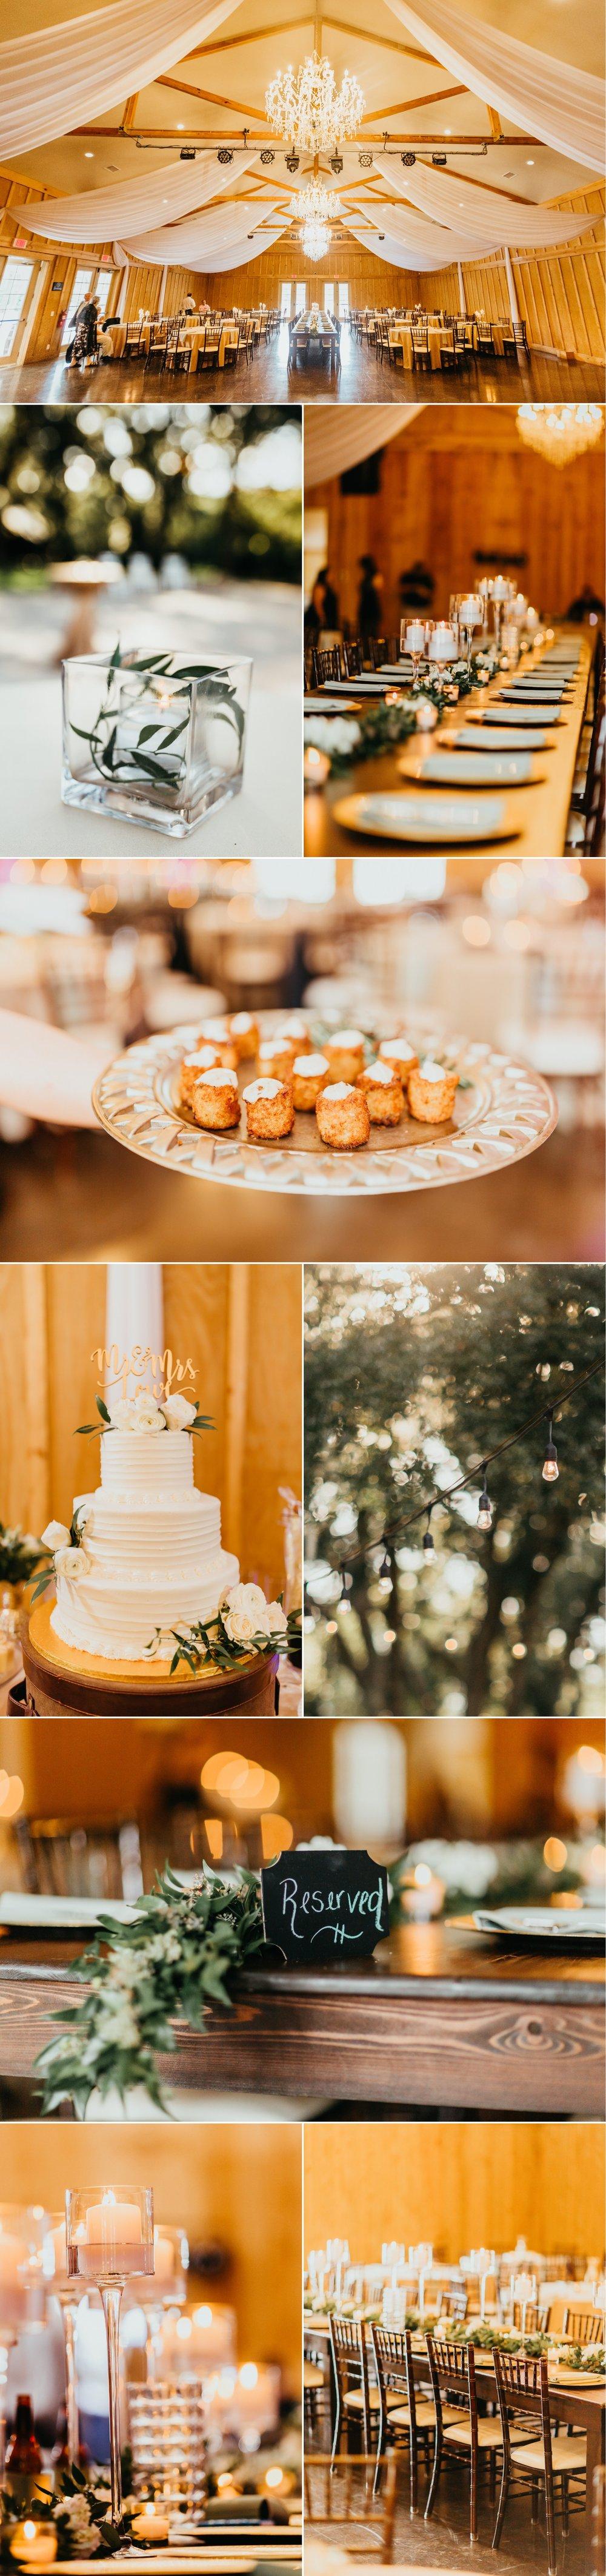 Bowing Oaks chic greenery farmhouse wedding reception decor